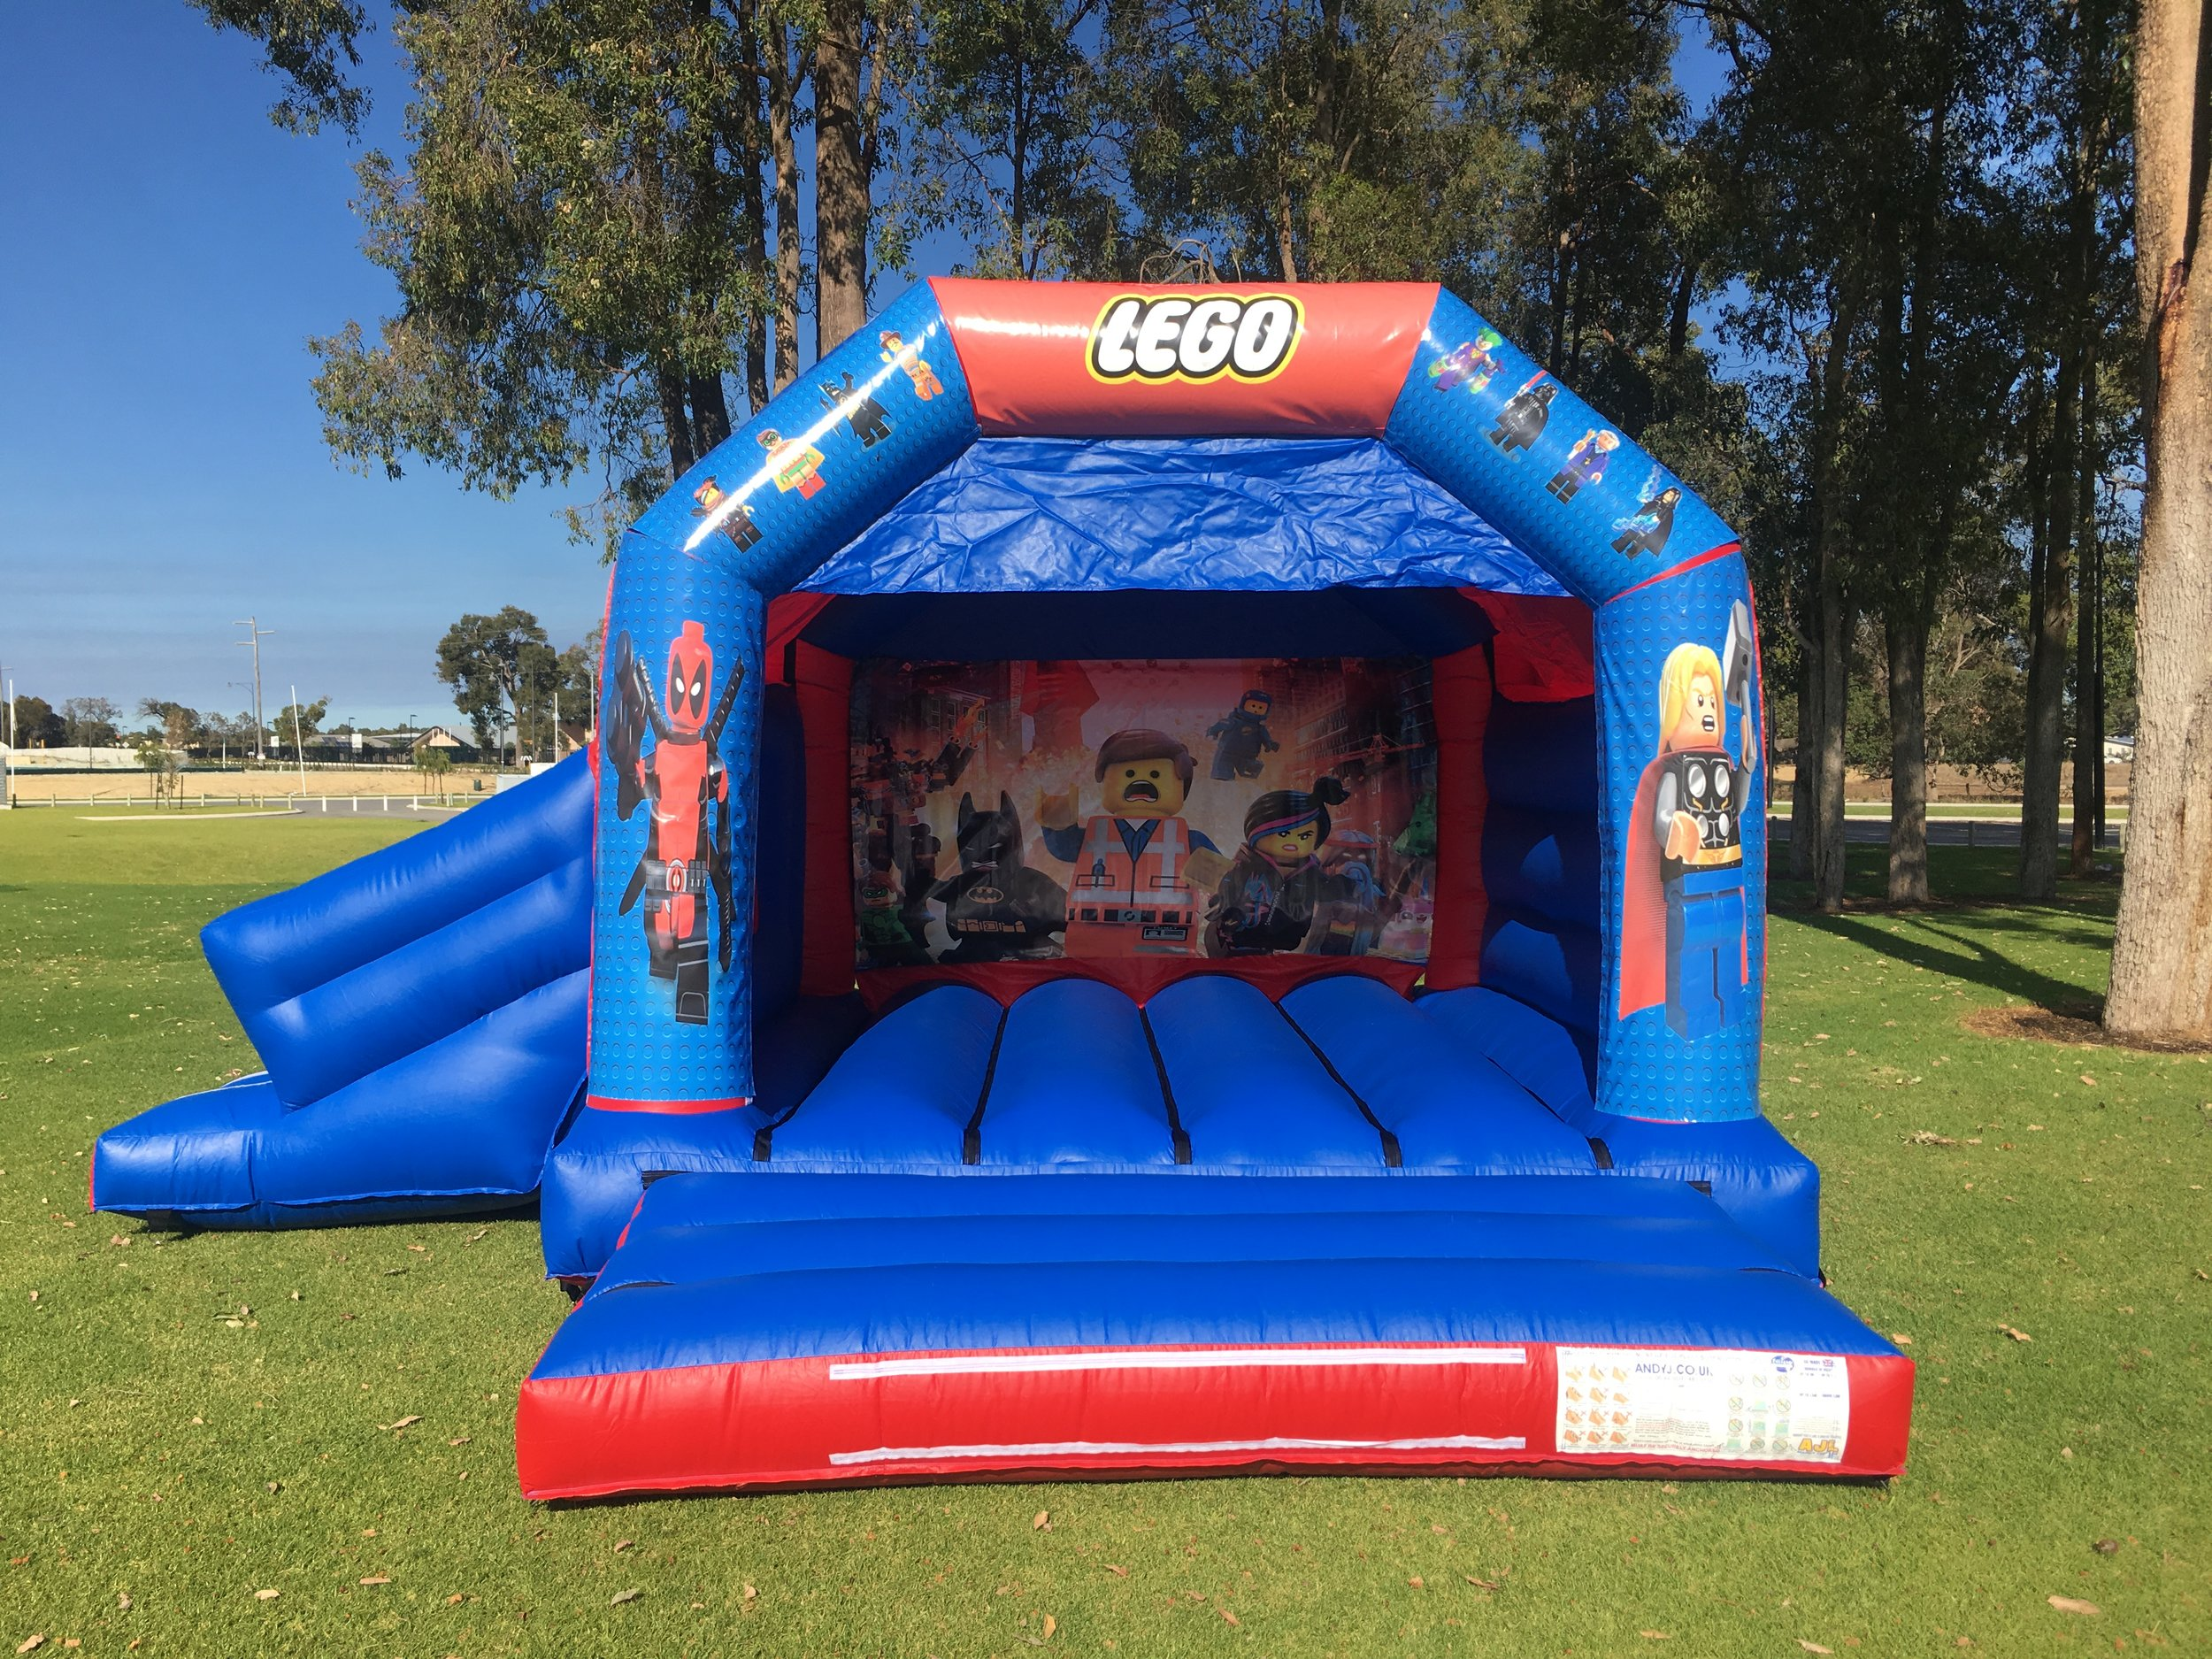 Lego Combo Bouncy Castle Hire Perth